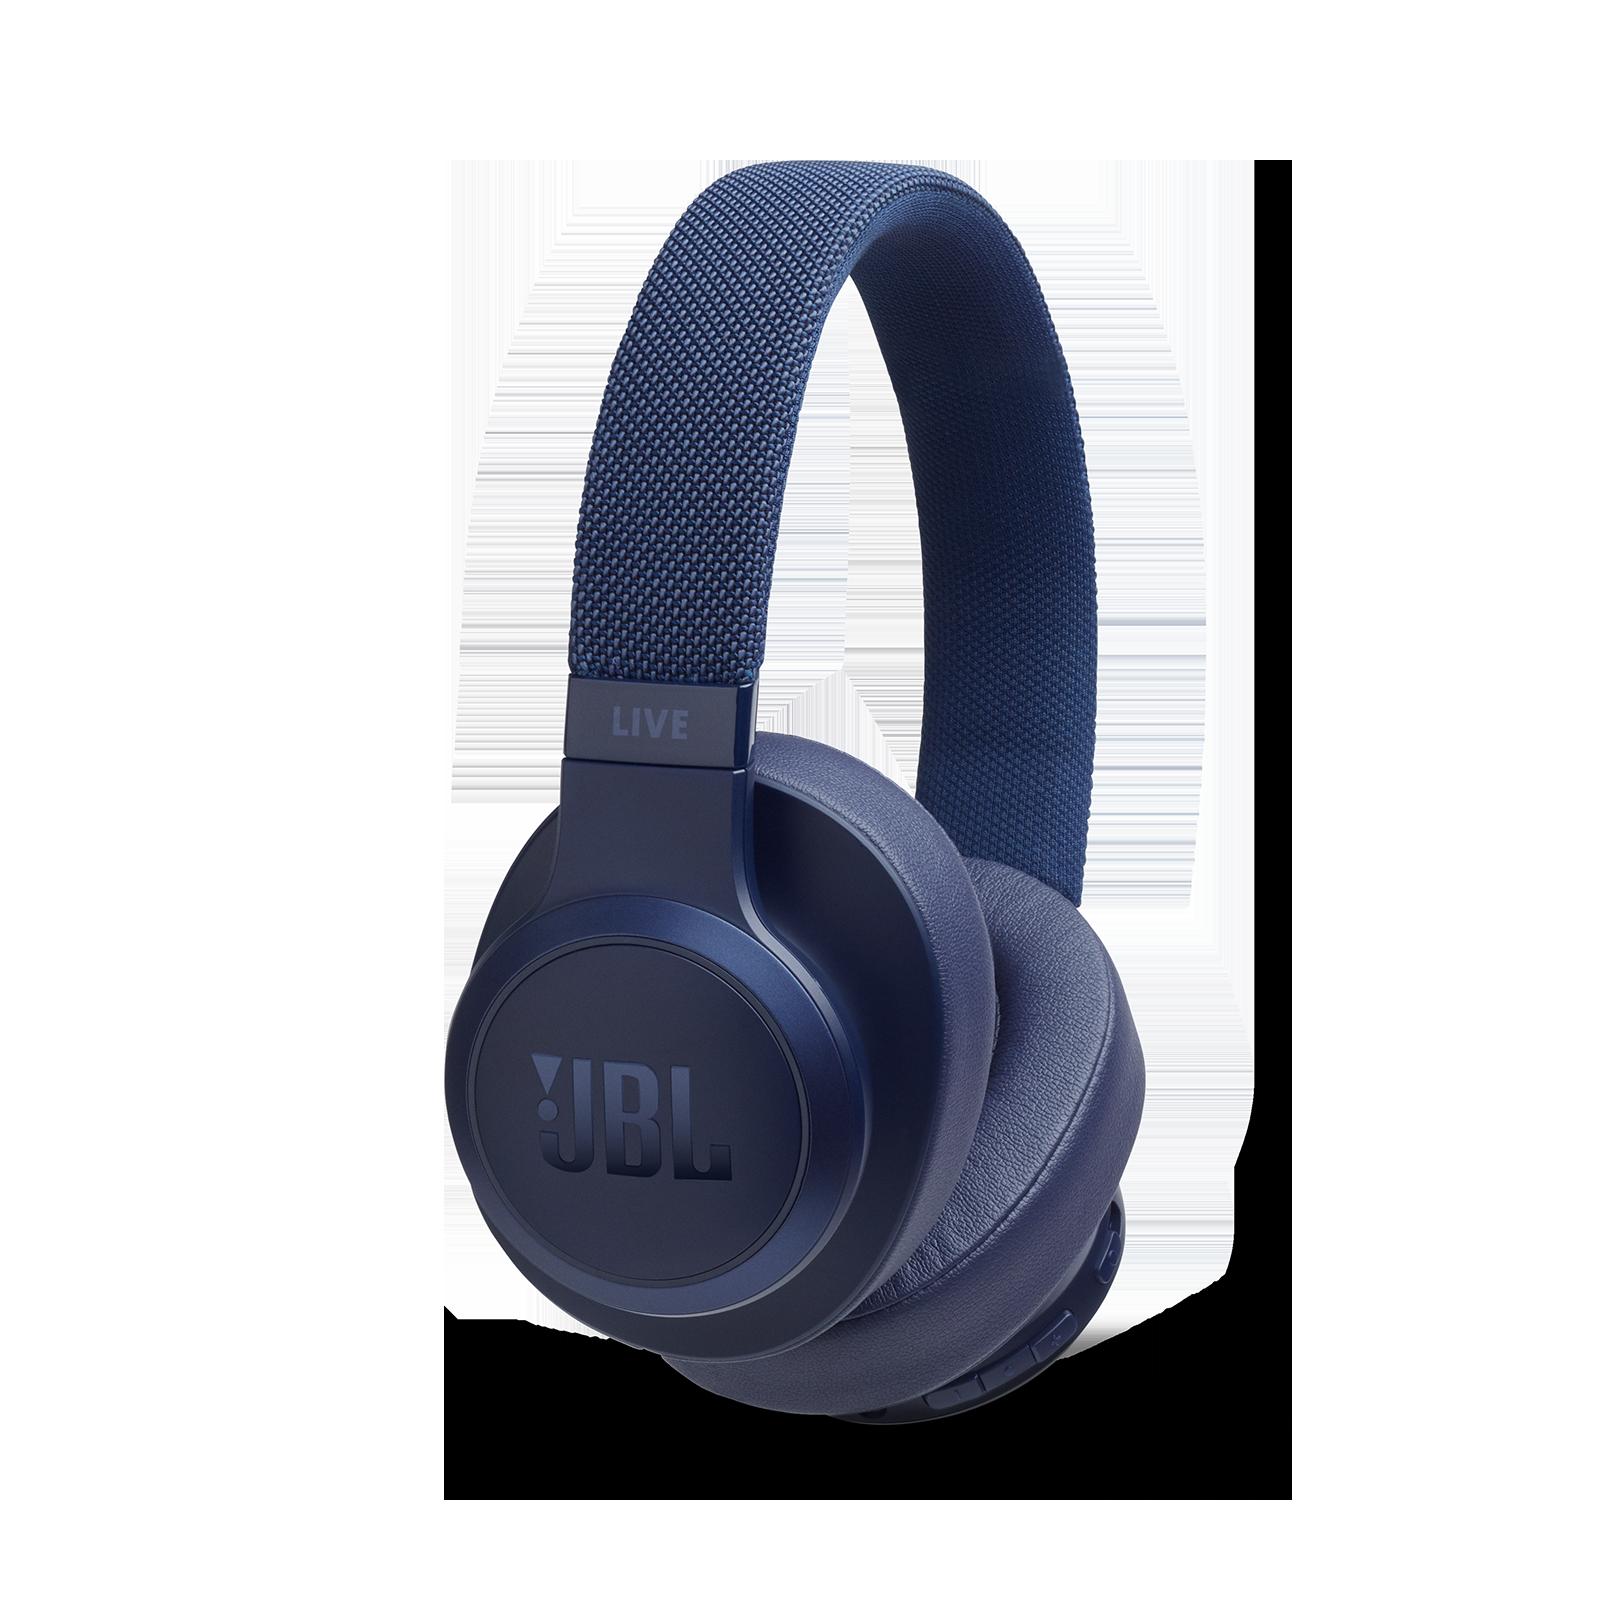 JBL LIVE 500BT - Blue - Your Sound, Unplugged - Hero